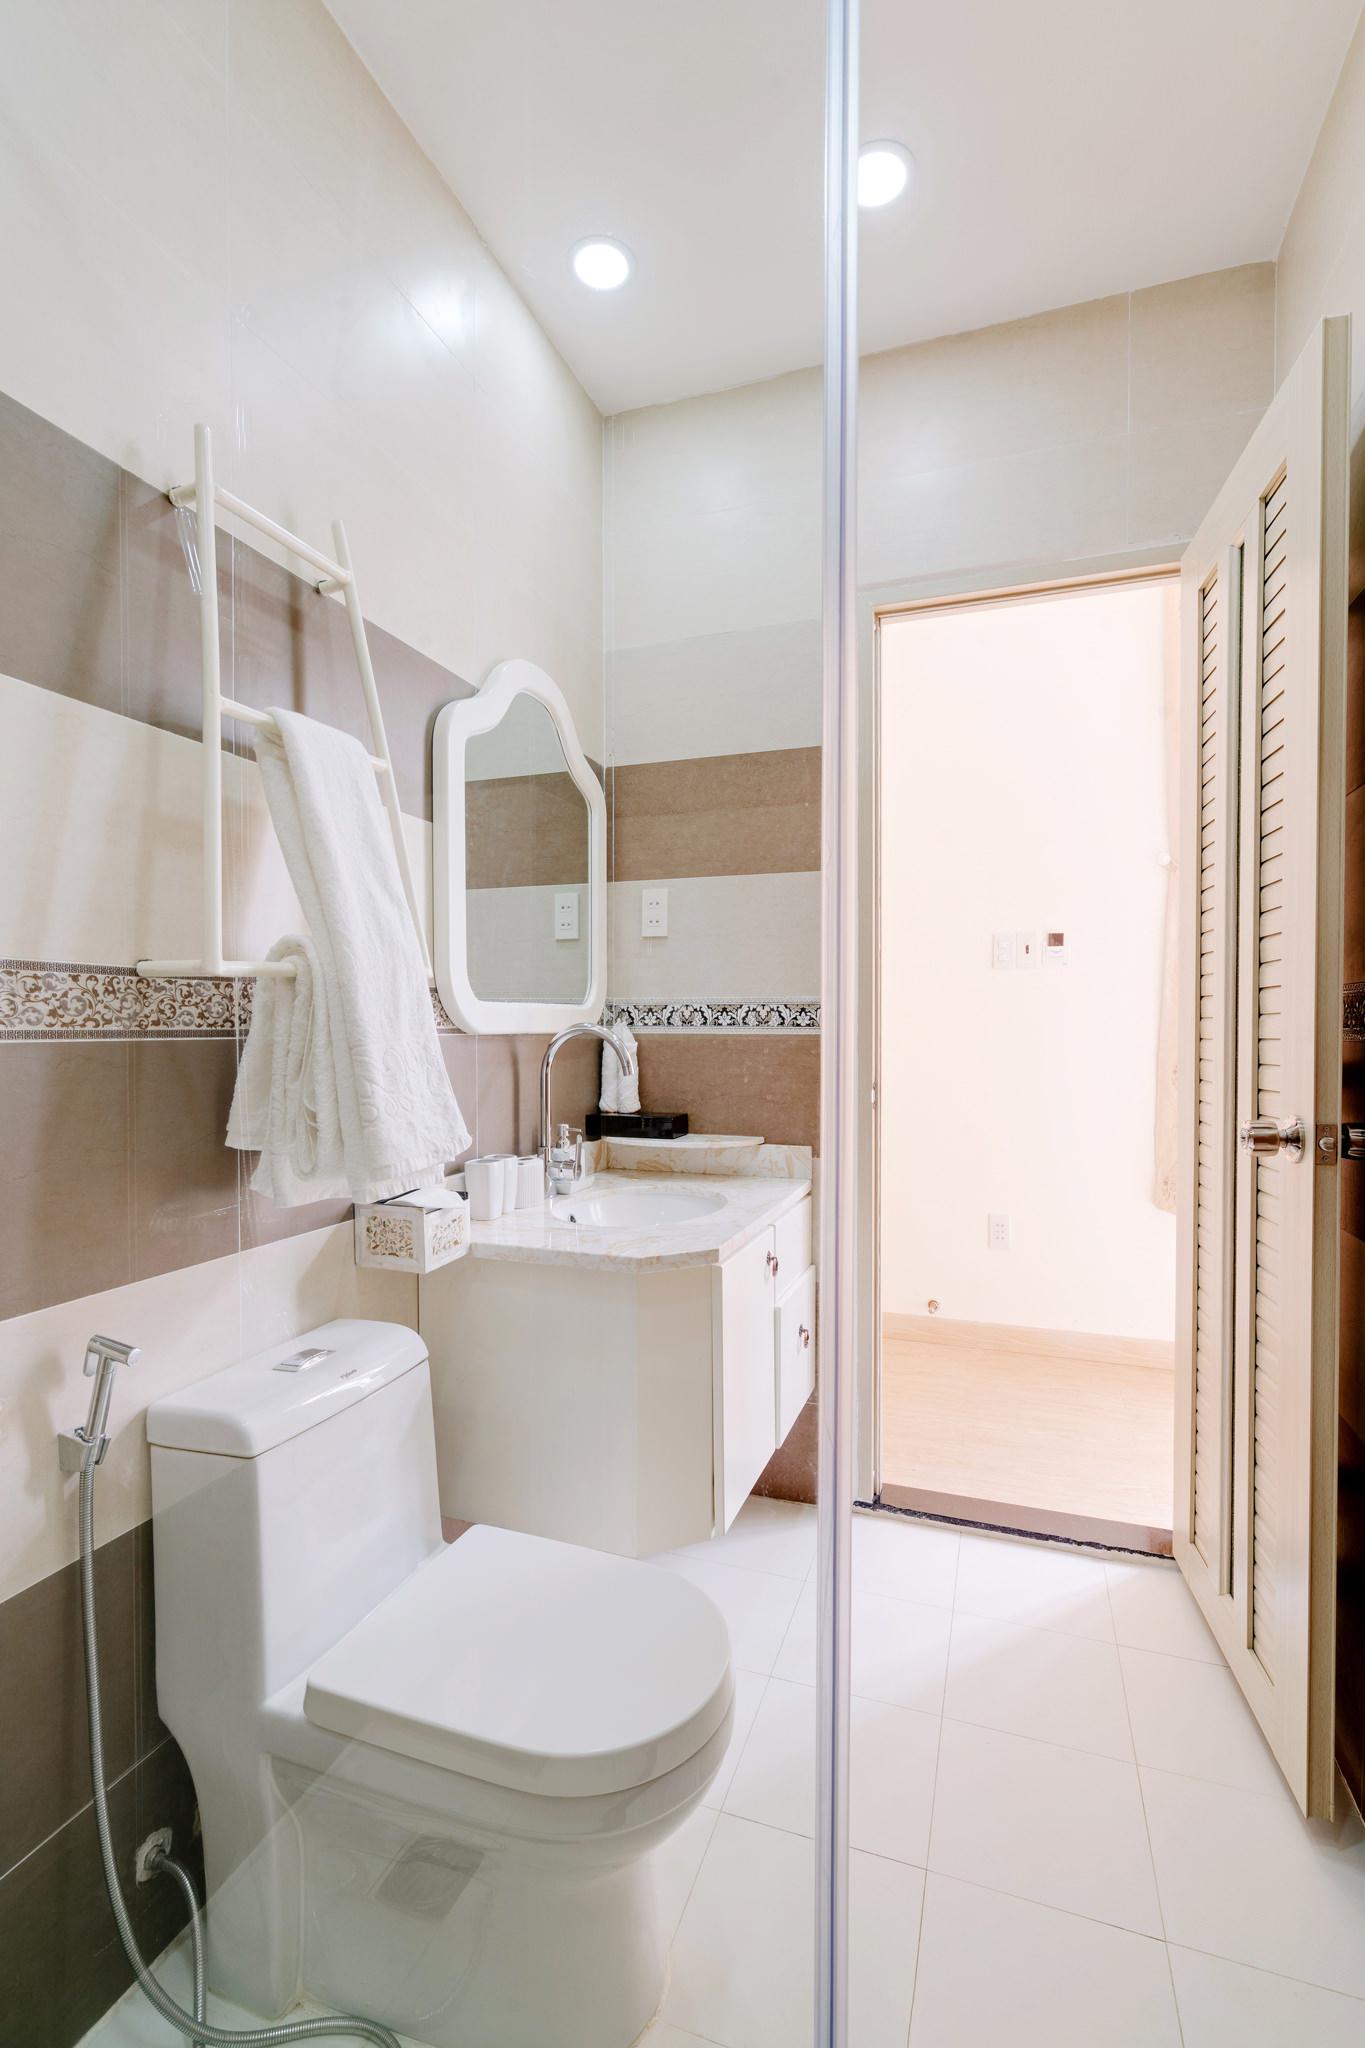 20180529 - Chez Mimosa - Interior - Hotel - 009.jpg